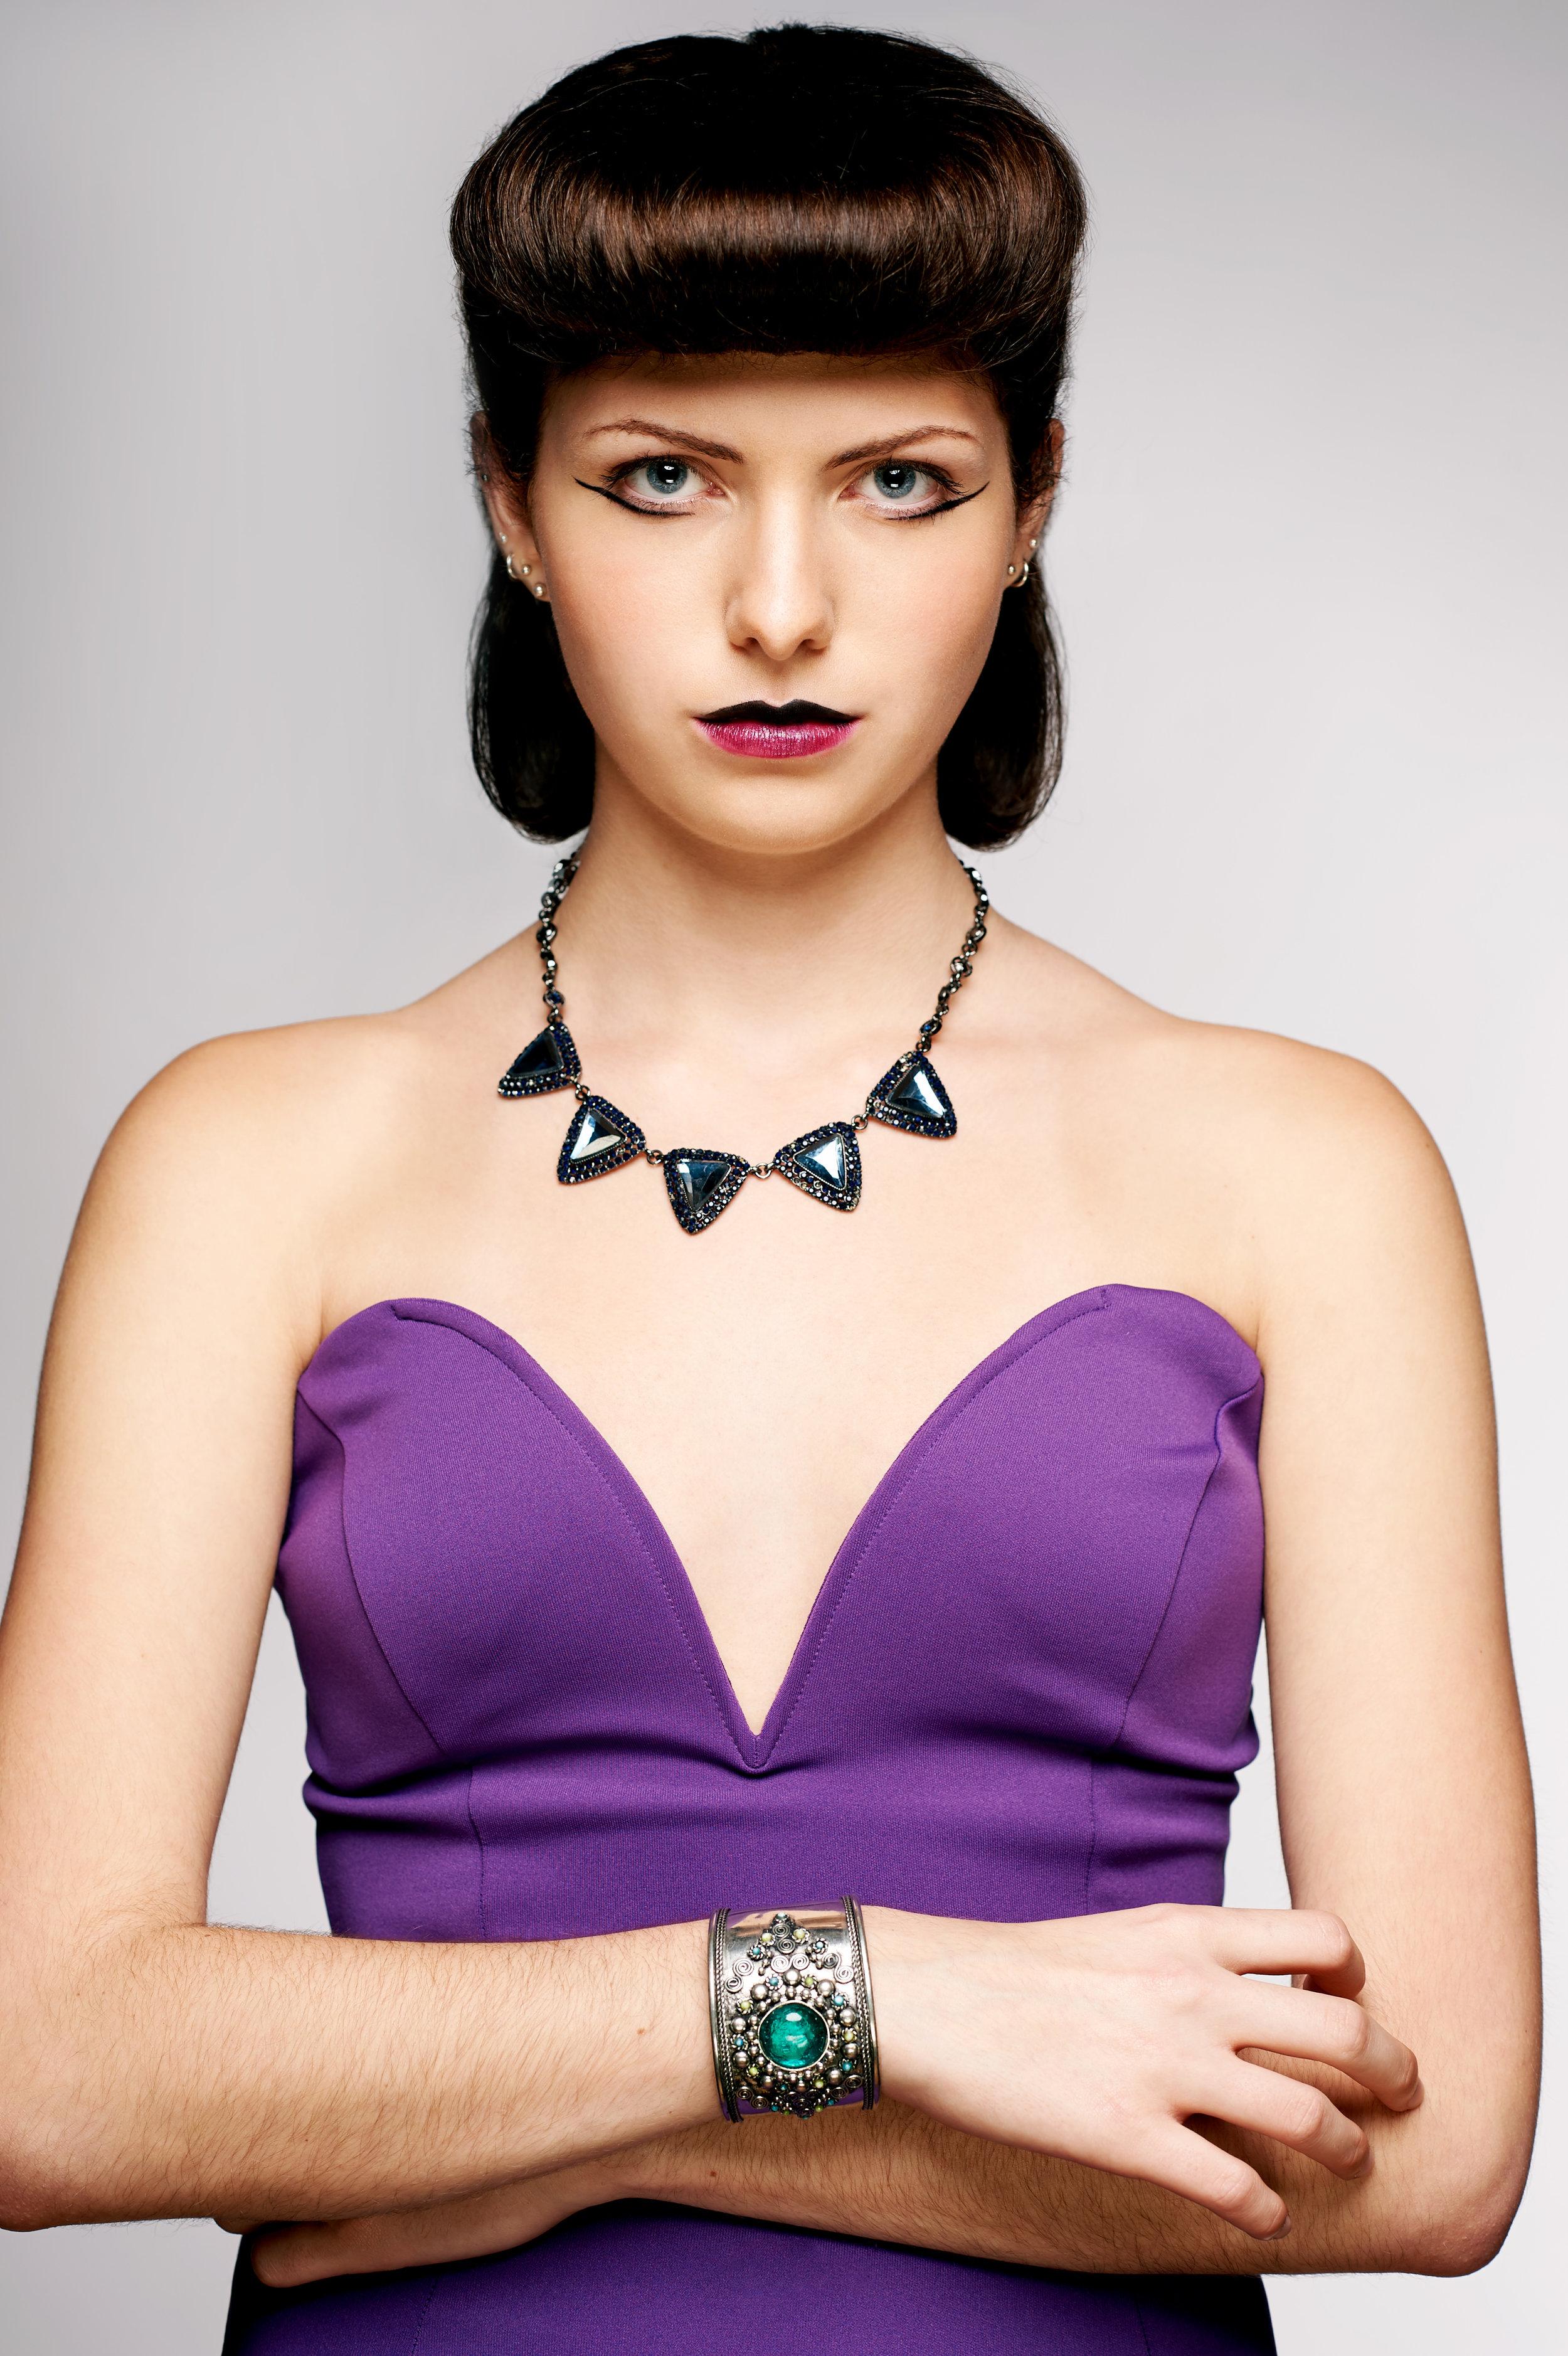 Marta-Hewson-Kayla-Stevens-Model-Fashion-Shoot-10010.jpg